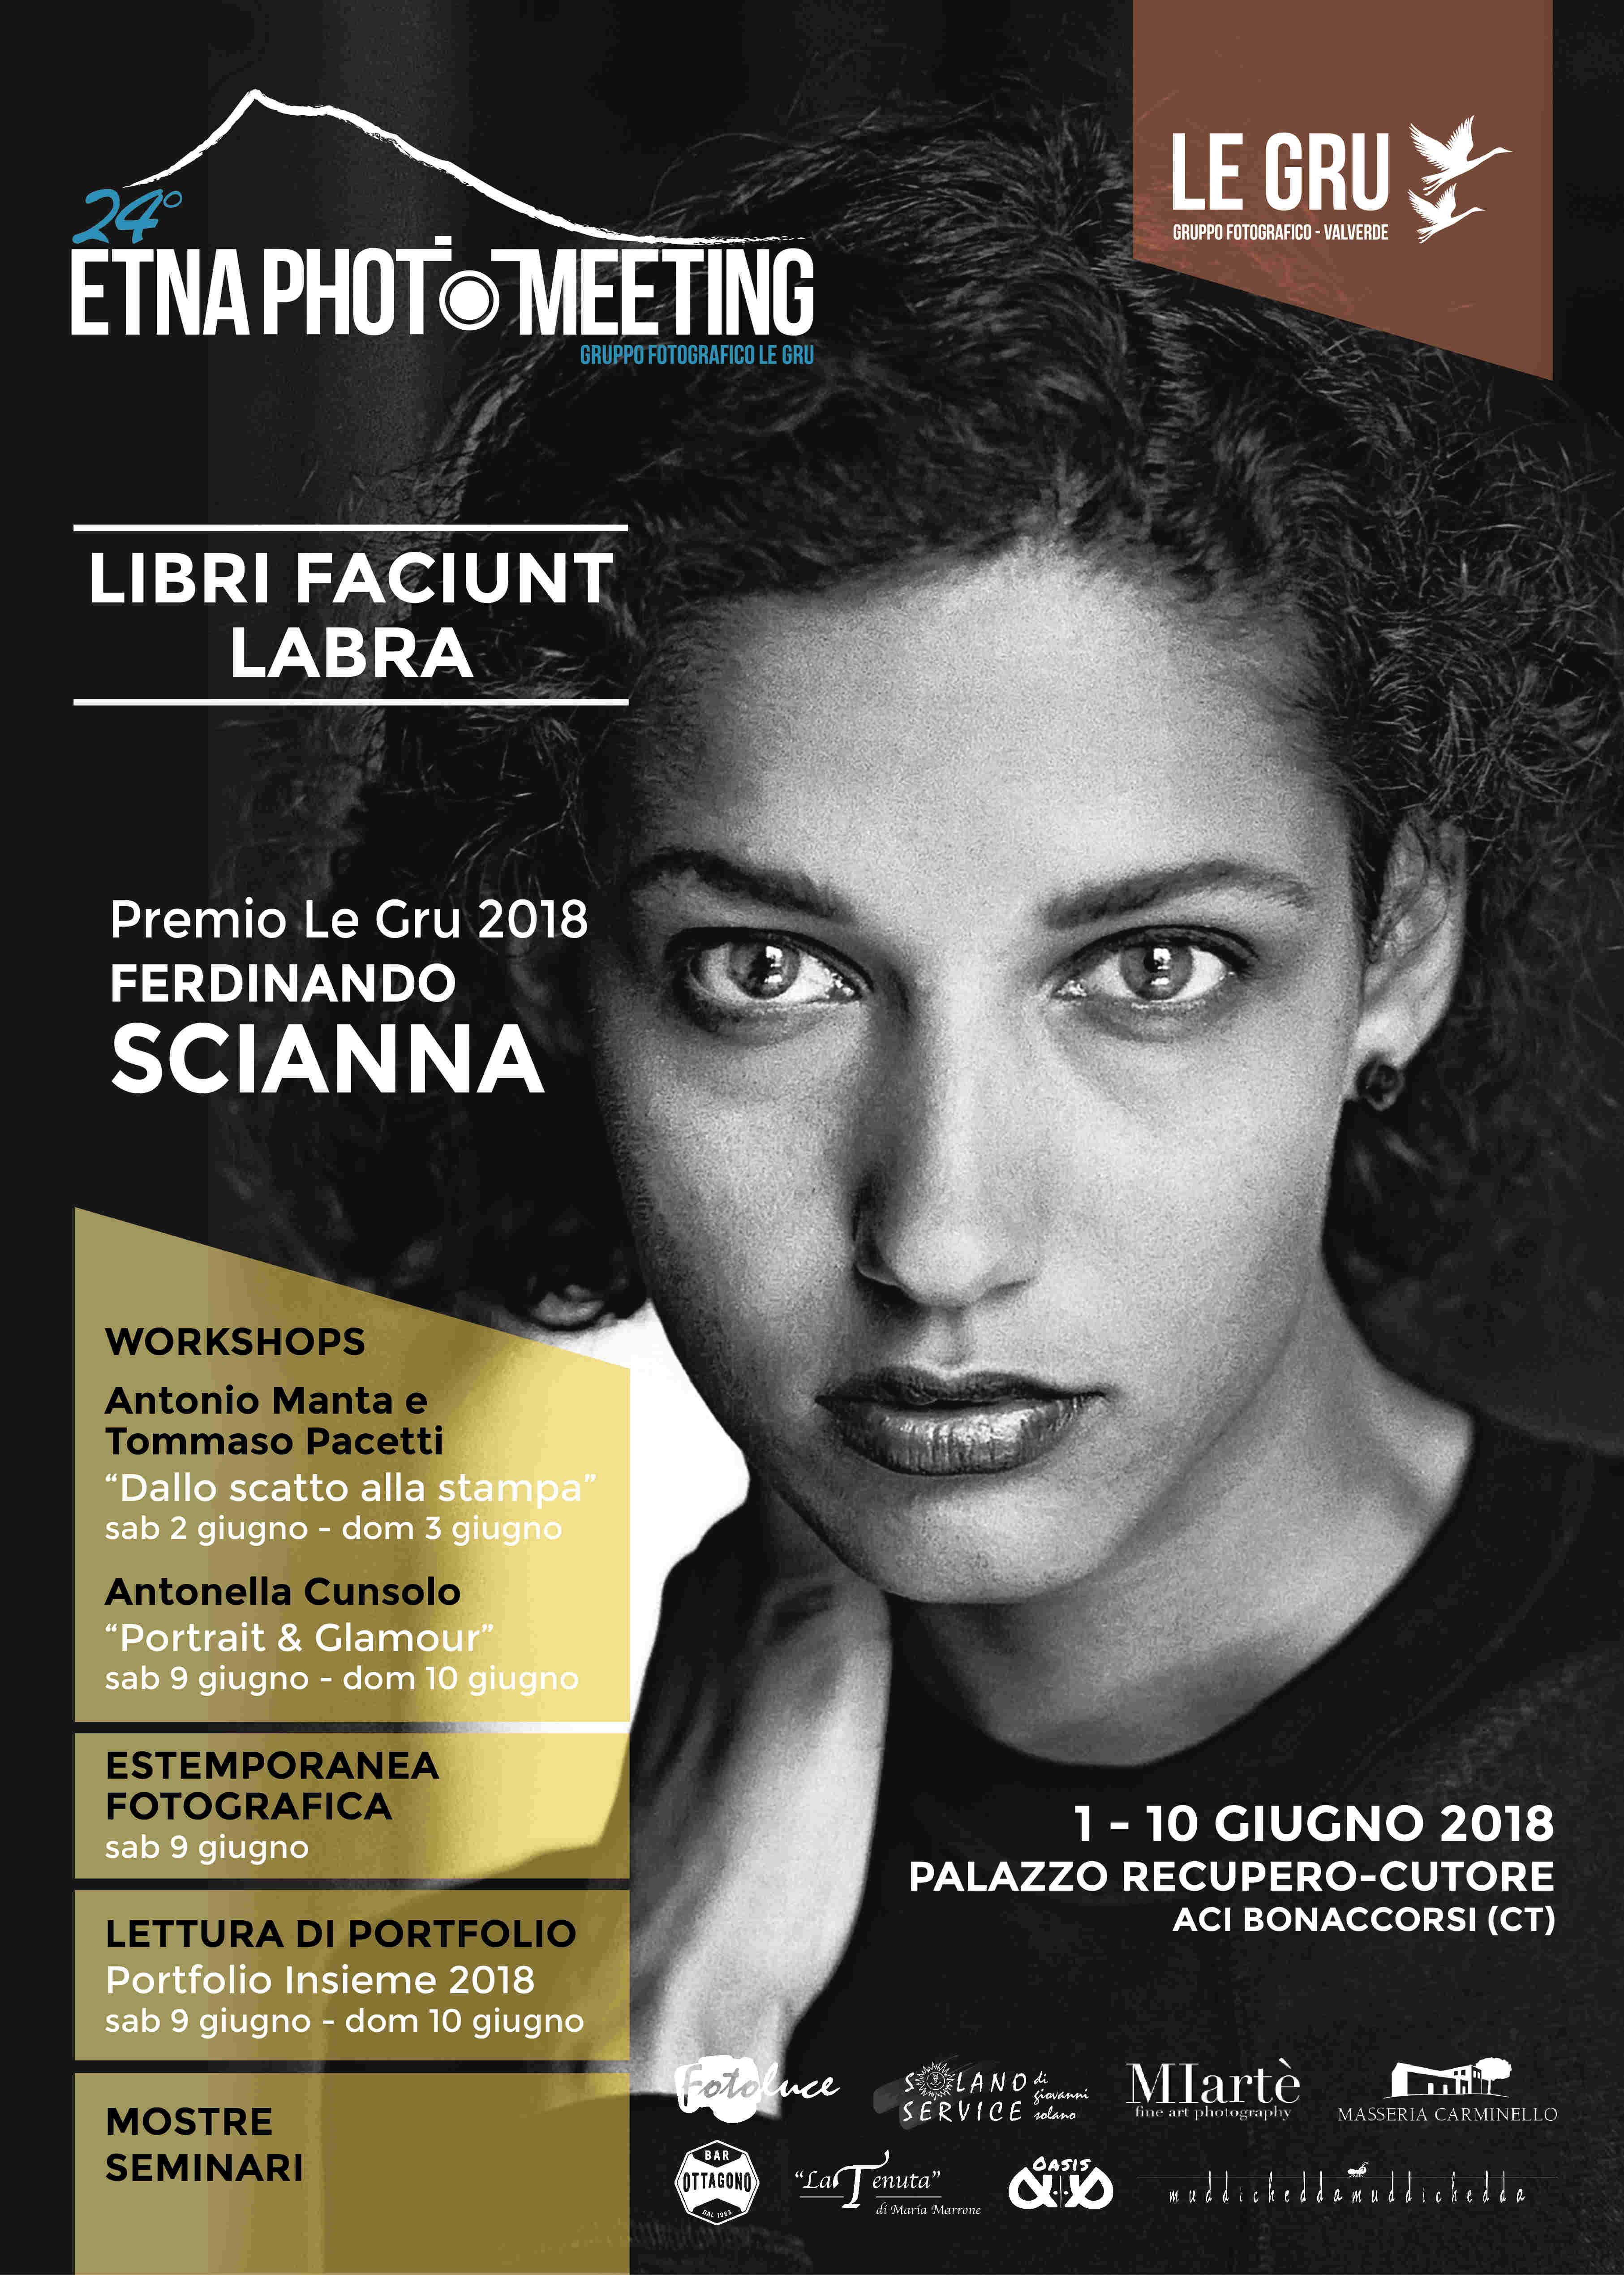 locandina_epm2018-1-web